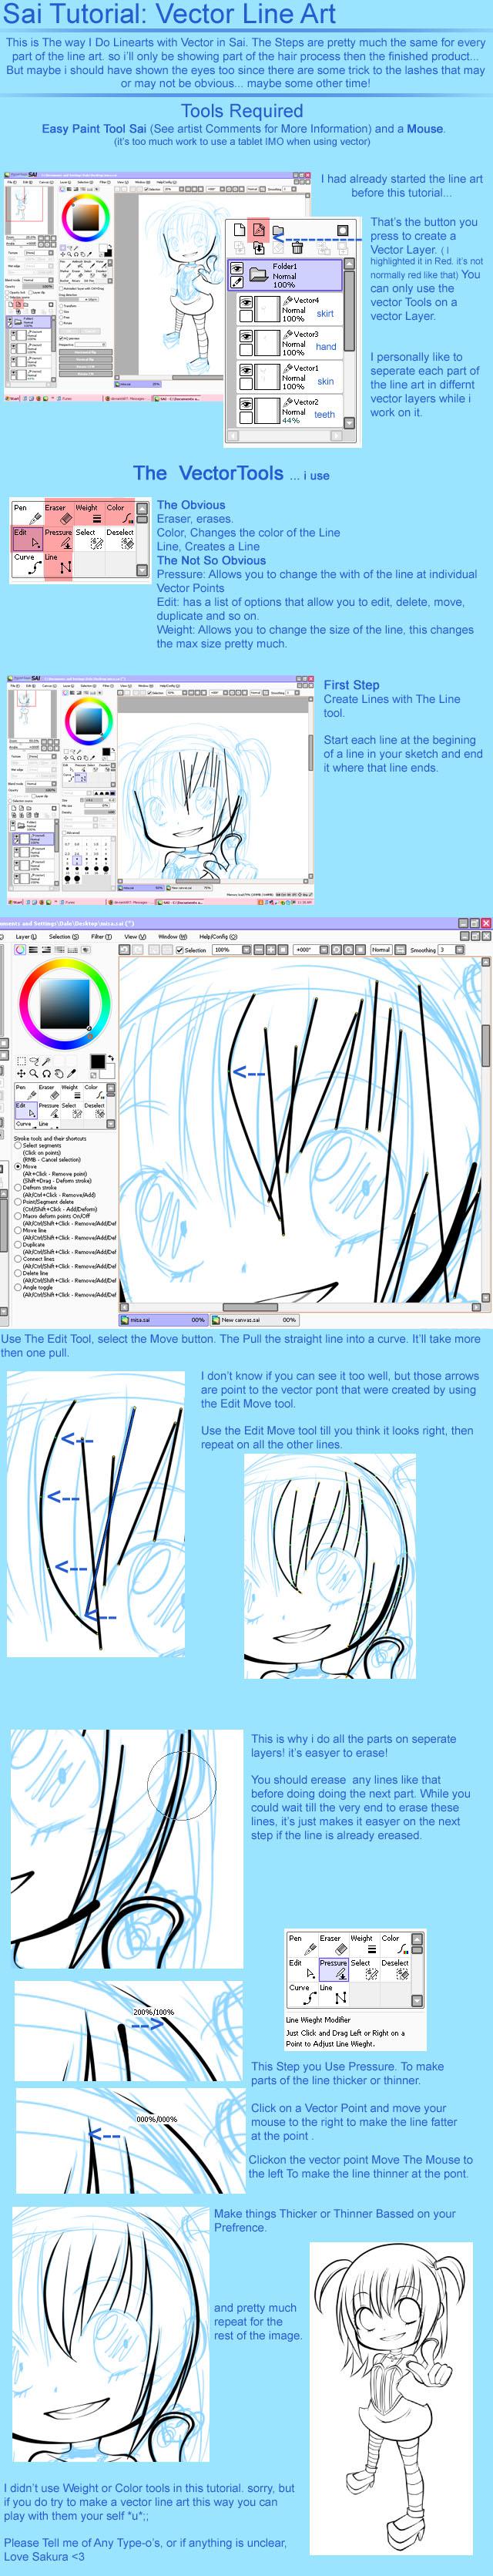 Line Art Design Tutorial : Sai tutorial vector line art by sakurachan on deviantart